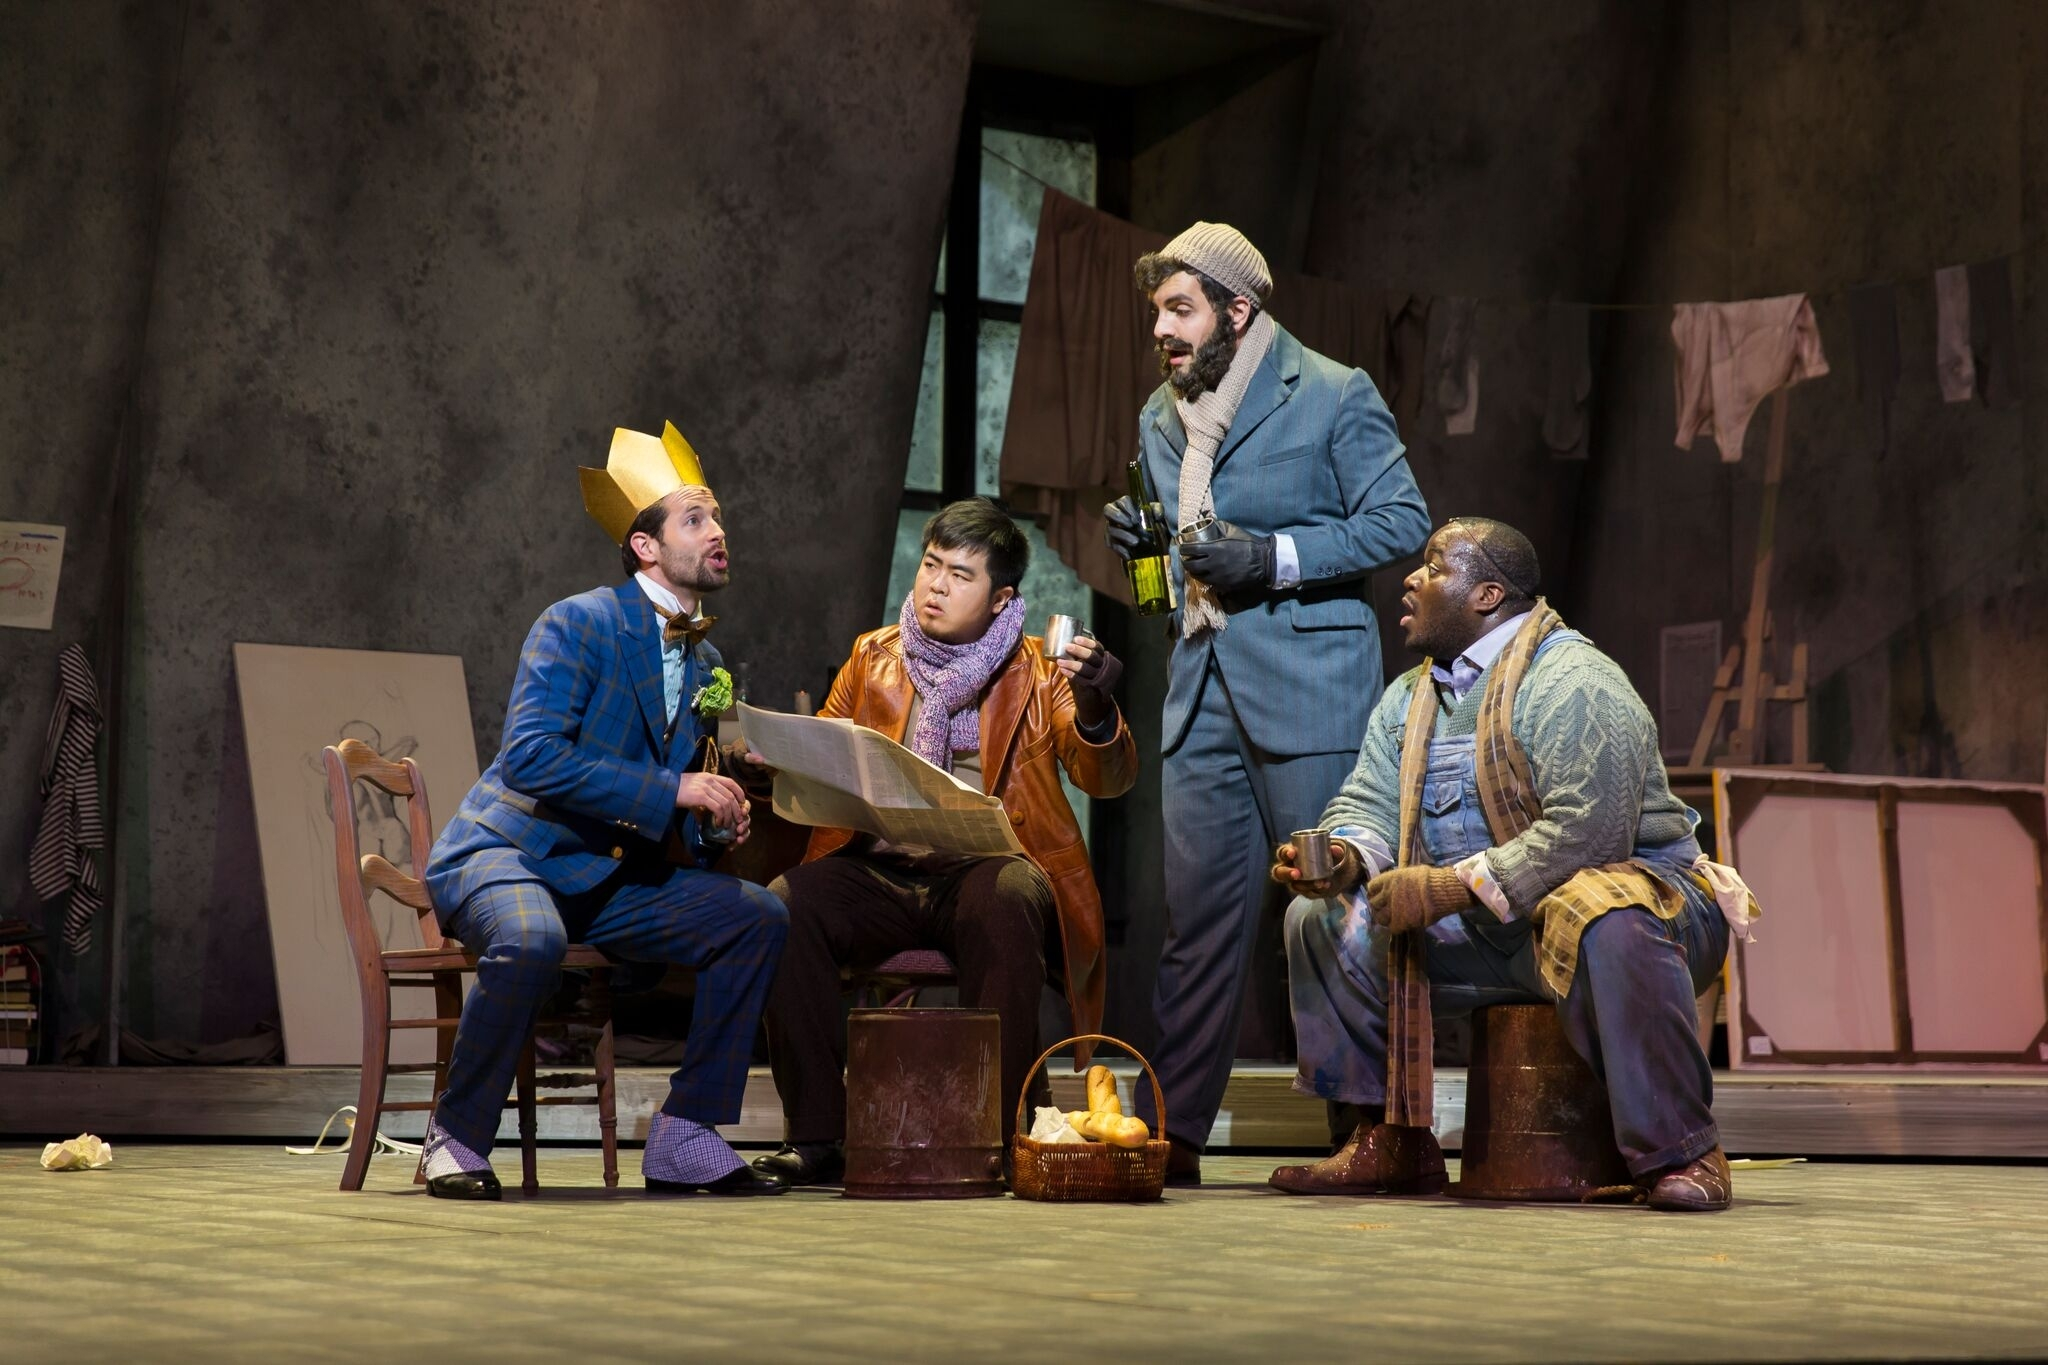 Shea Owens as Schaunard; Yongshao Yu as Rodolfo; Timothy Bruno as Colline; Reginald Smith, Jr. as Marcello; photo by Scott Suchman; courtesy of Wolf Trap Opera 2016.